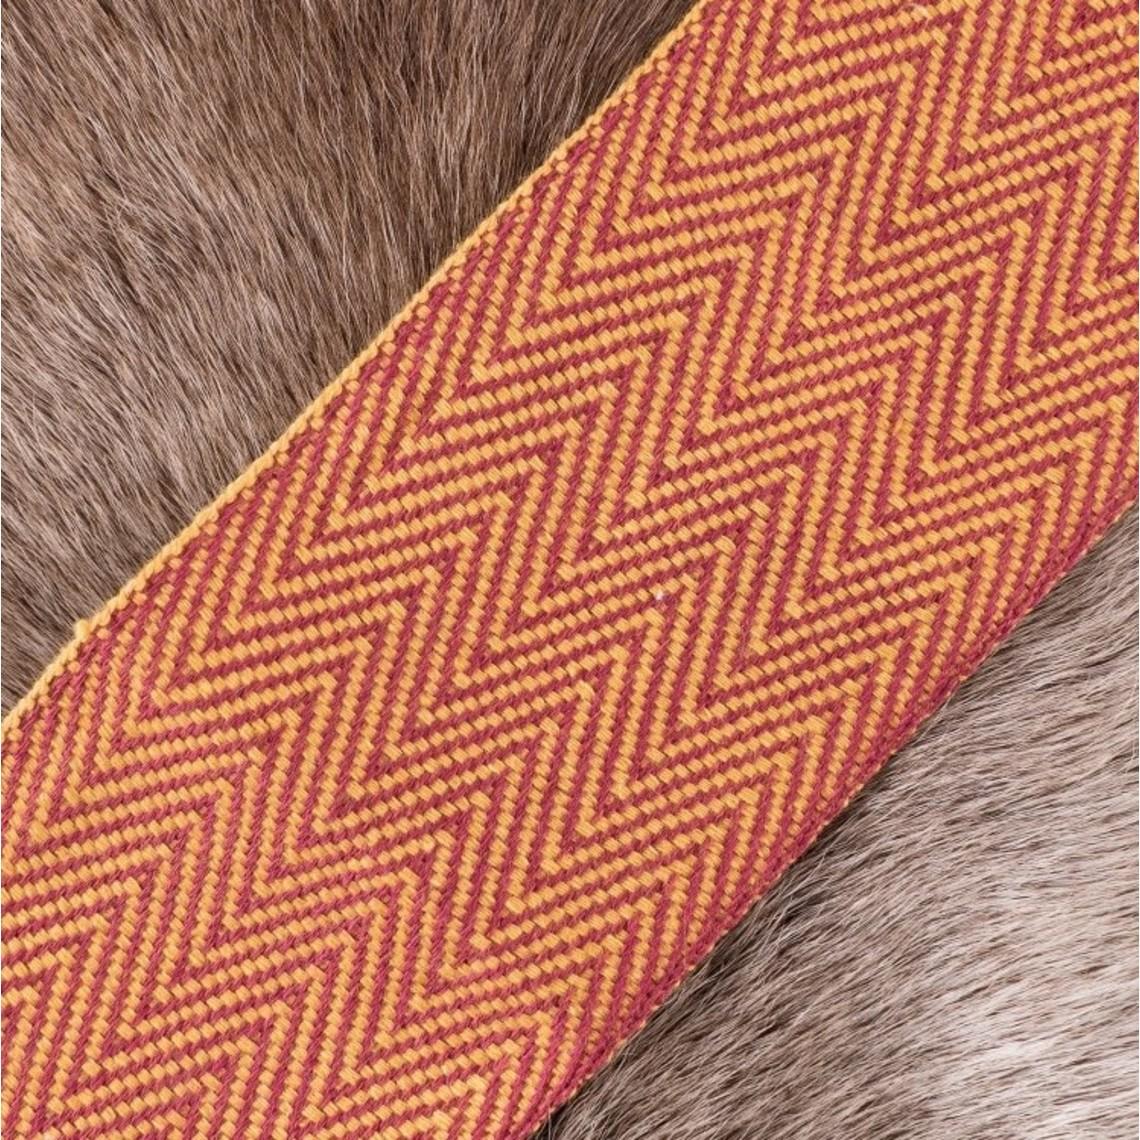 Sildeben motiv fabric gul-rød, 10 cm bred, pr 7 meter